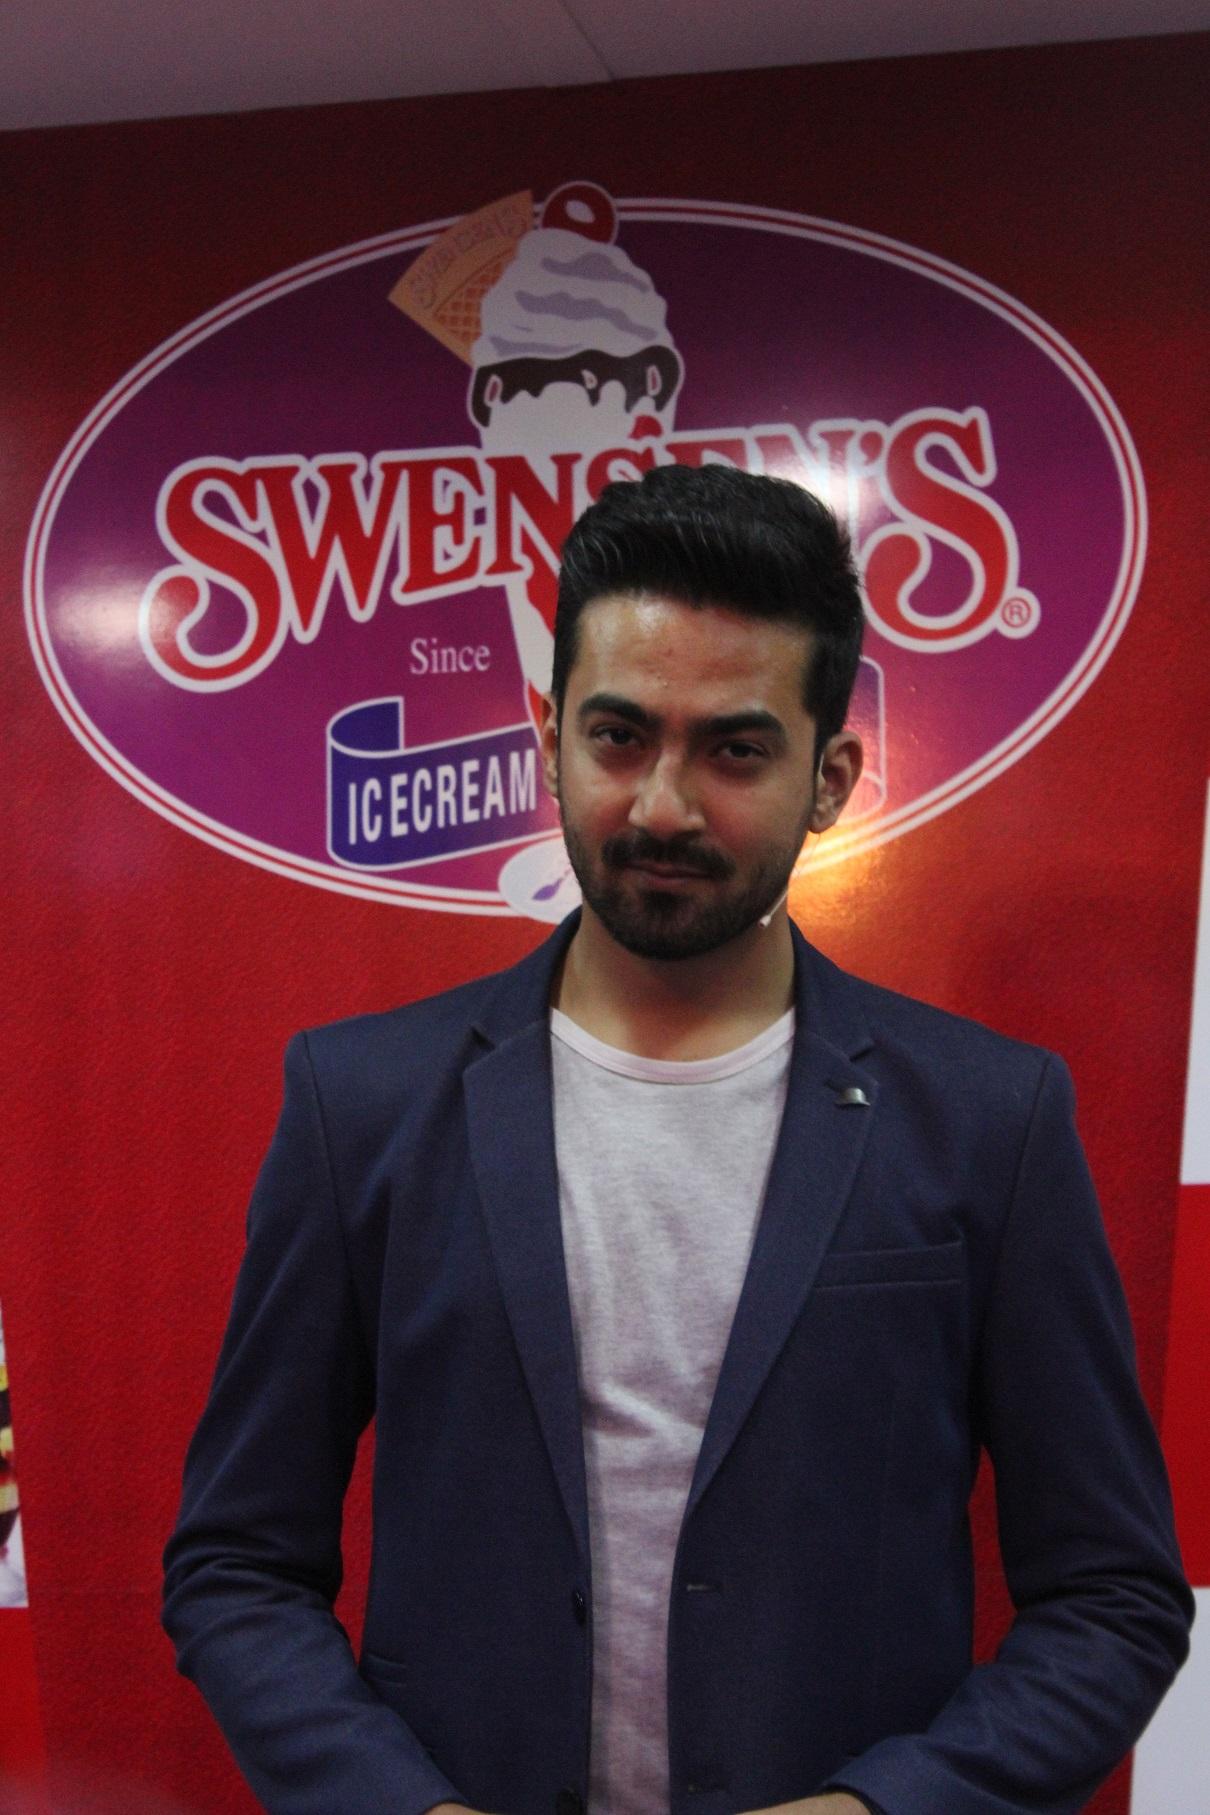 Swensen's Pakistan - Ultimate Sundae Experience 2